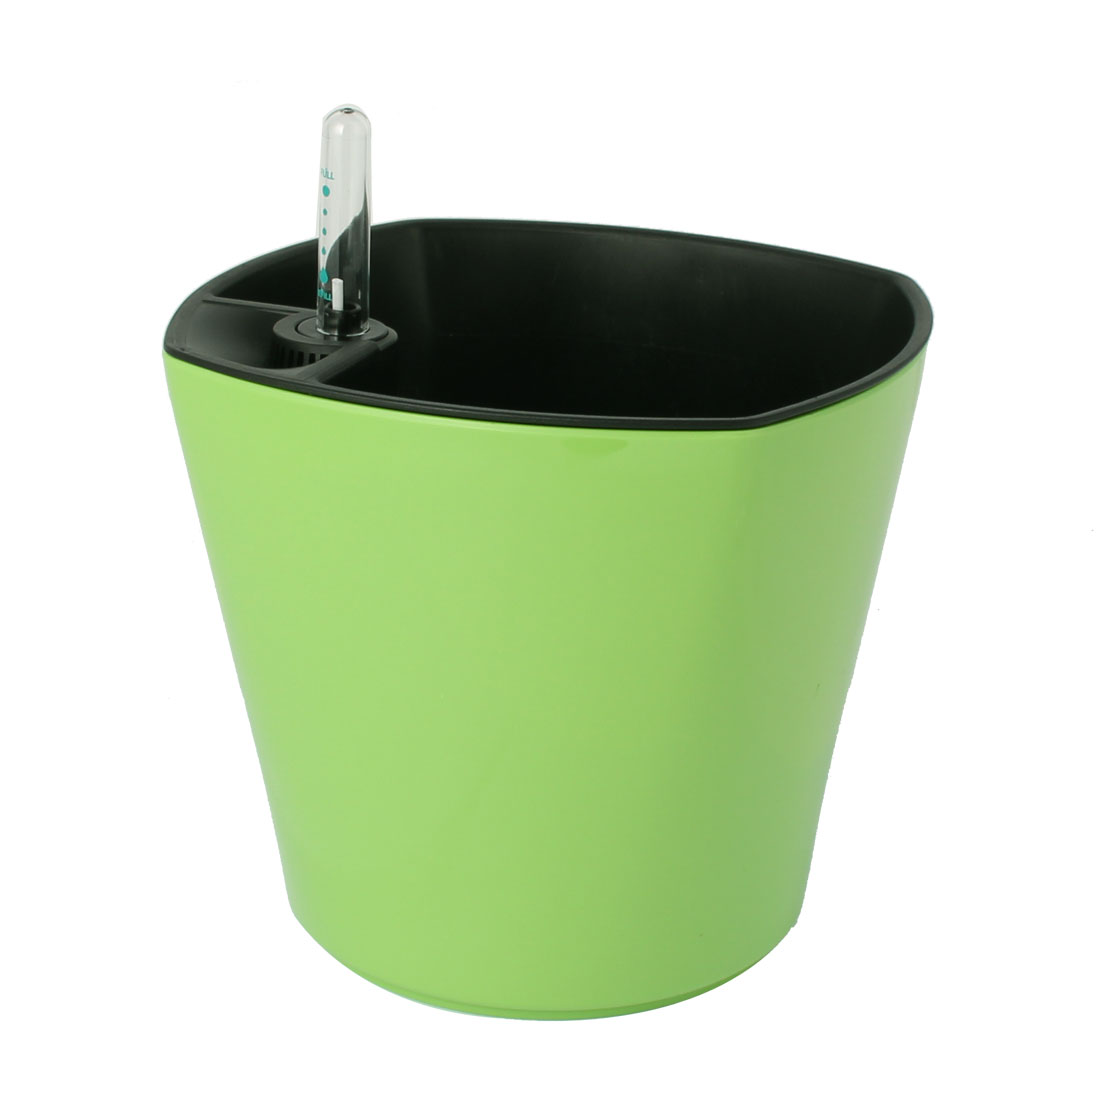 Plastic Self Watering Planter Flowerpot Pot Apple Green w Water Level Indicator